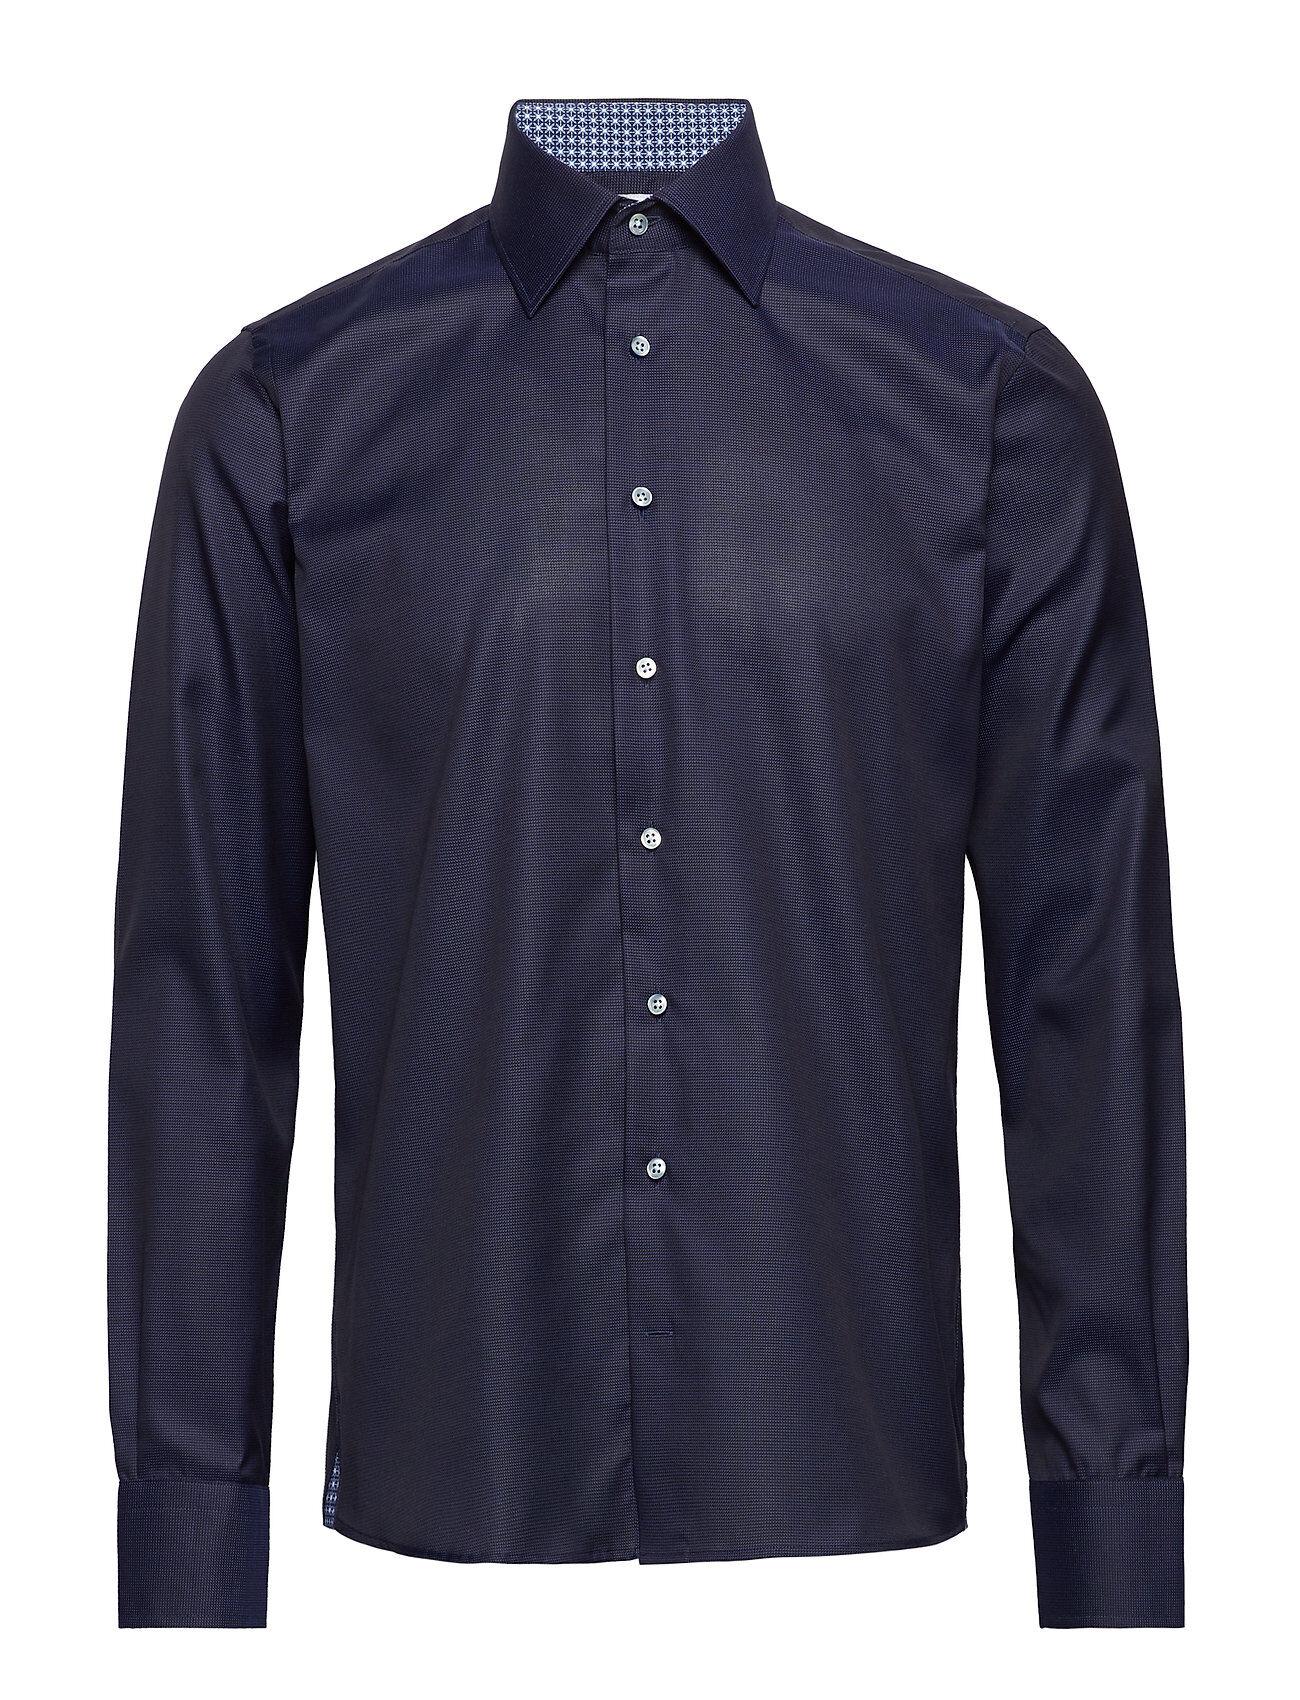 XO Shirtmaker by Sand Copenhagen 8943 Details - Gordon Sc